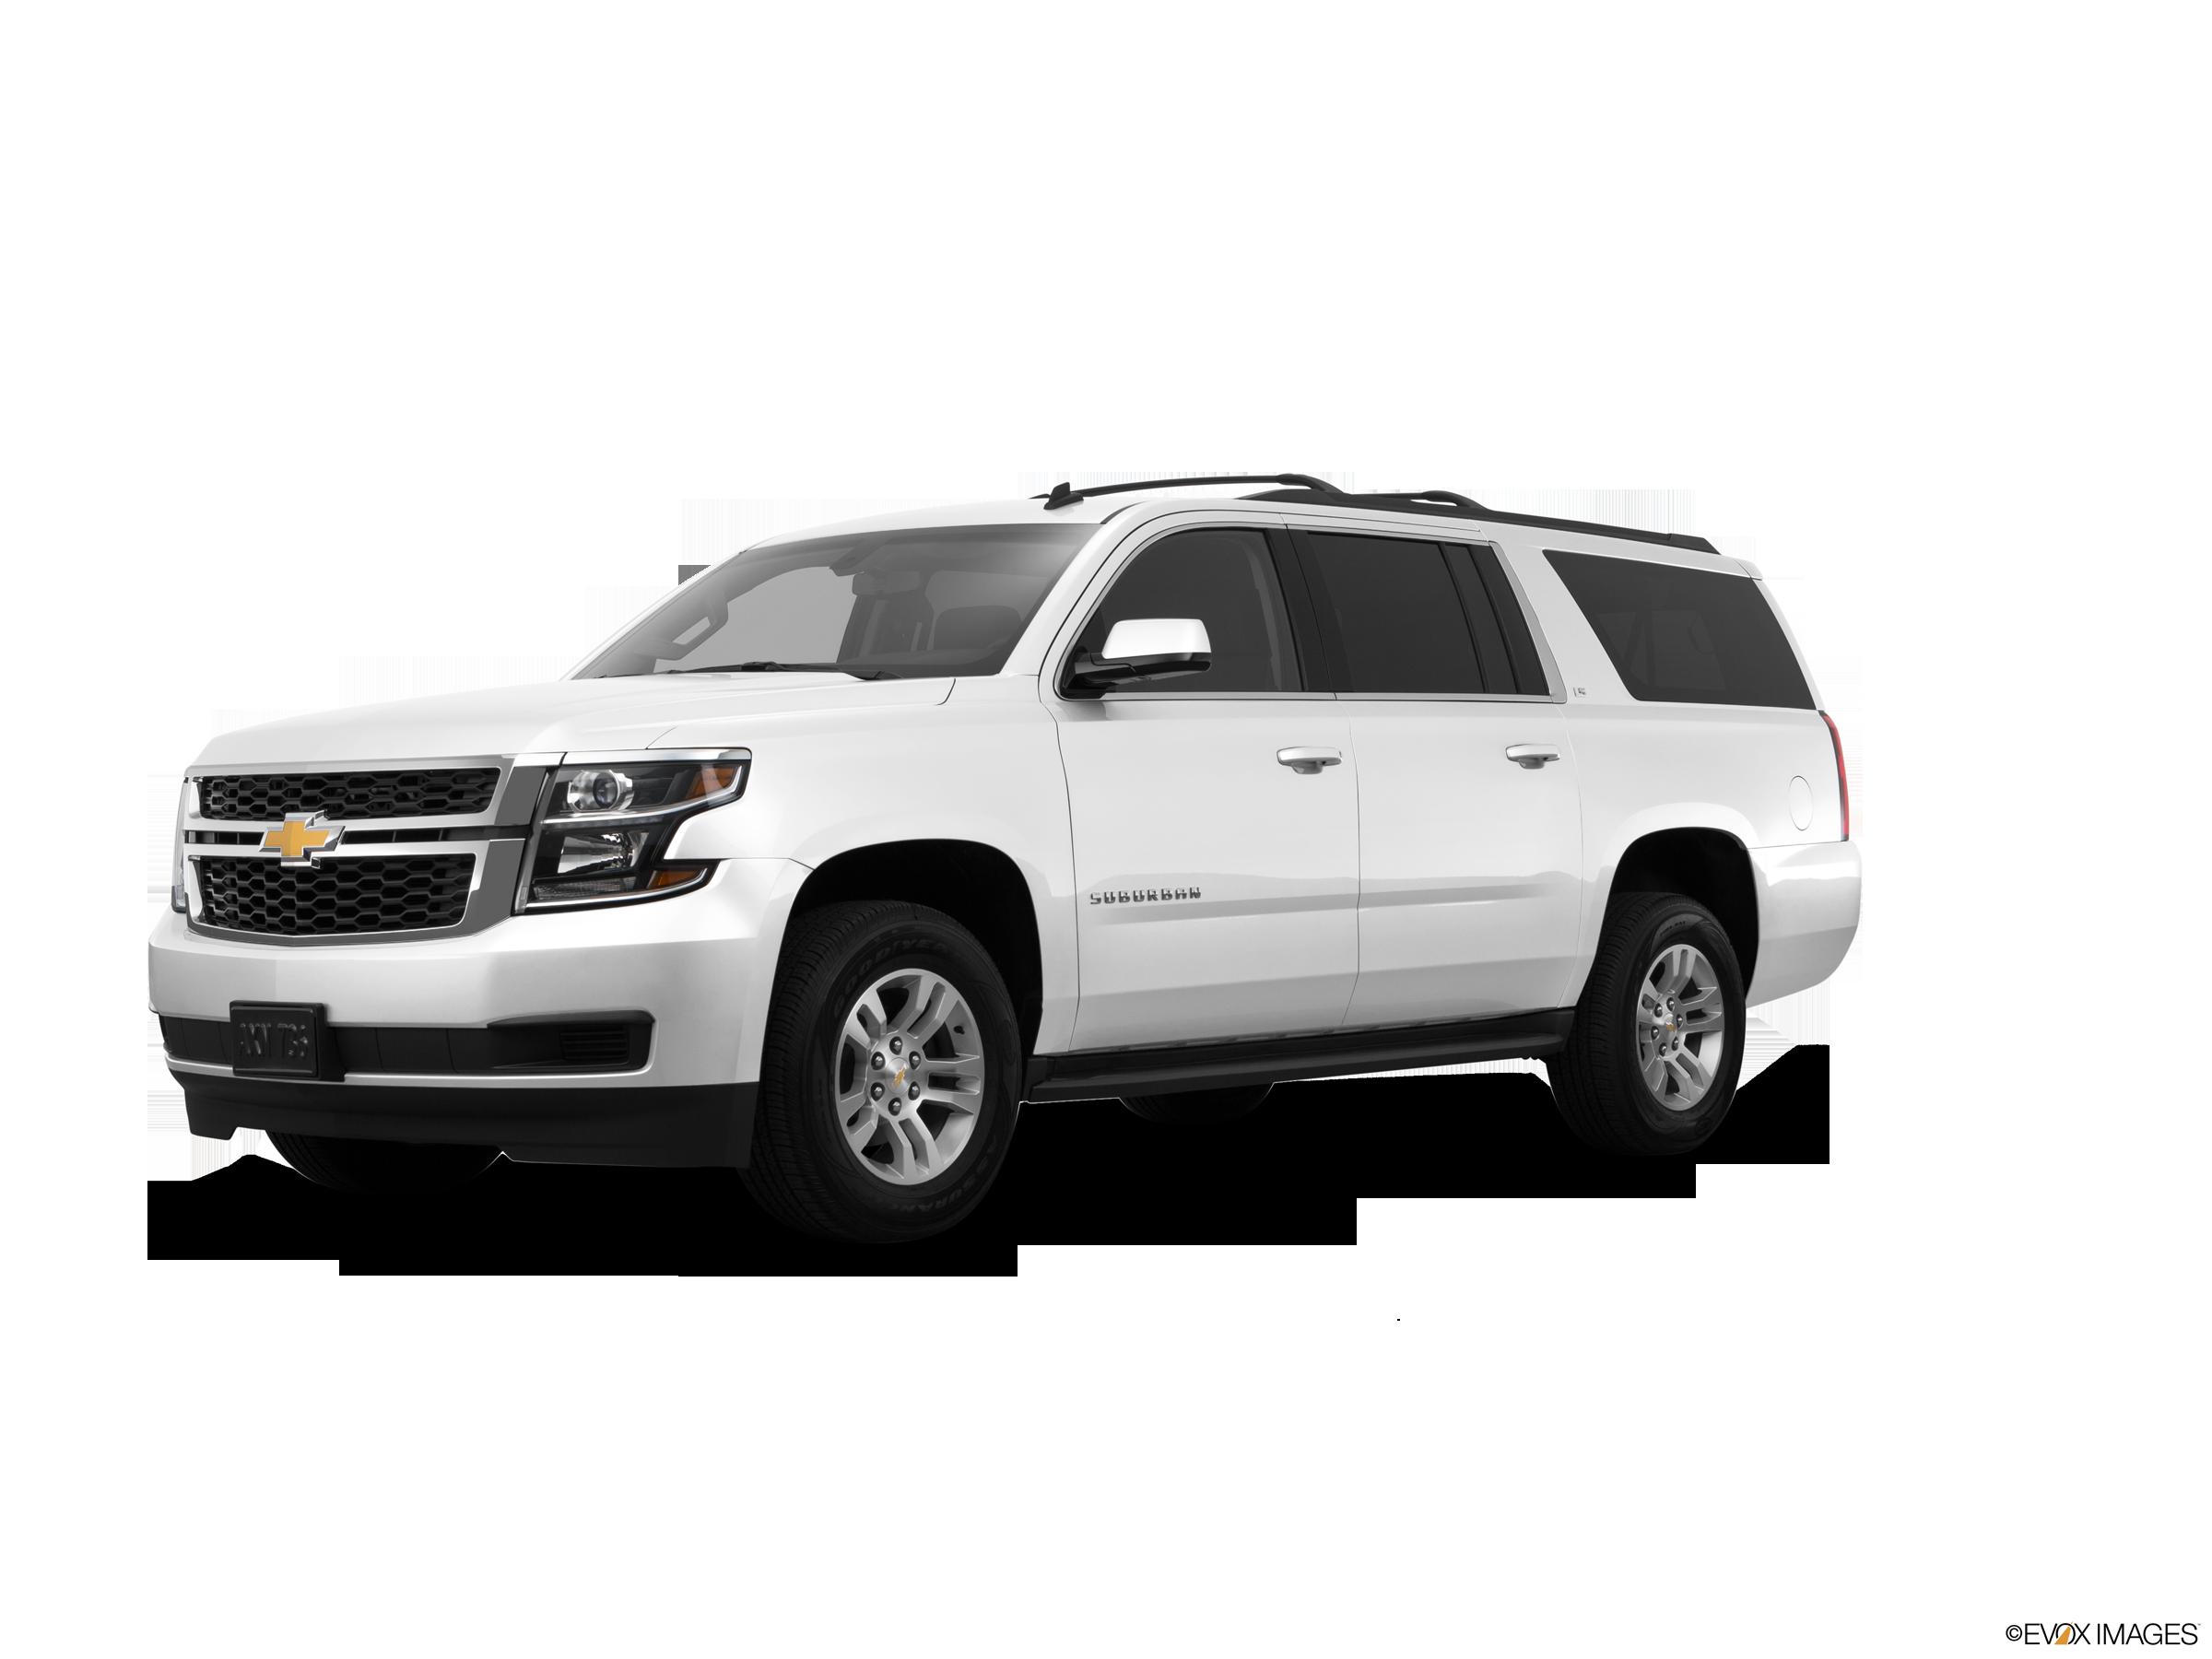 2015 Chevrolet Suburban Values Cars For Sale Kelley Blue Book